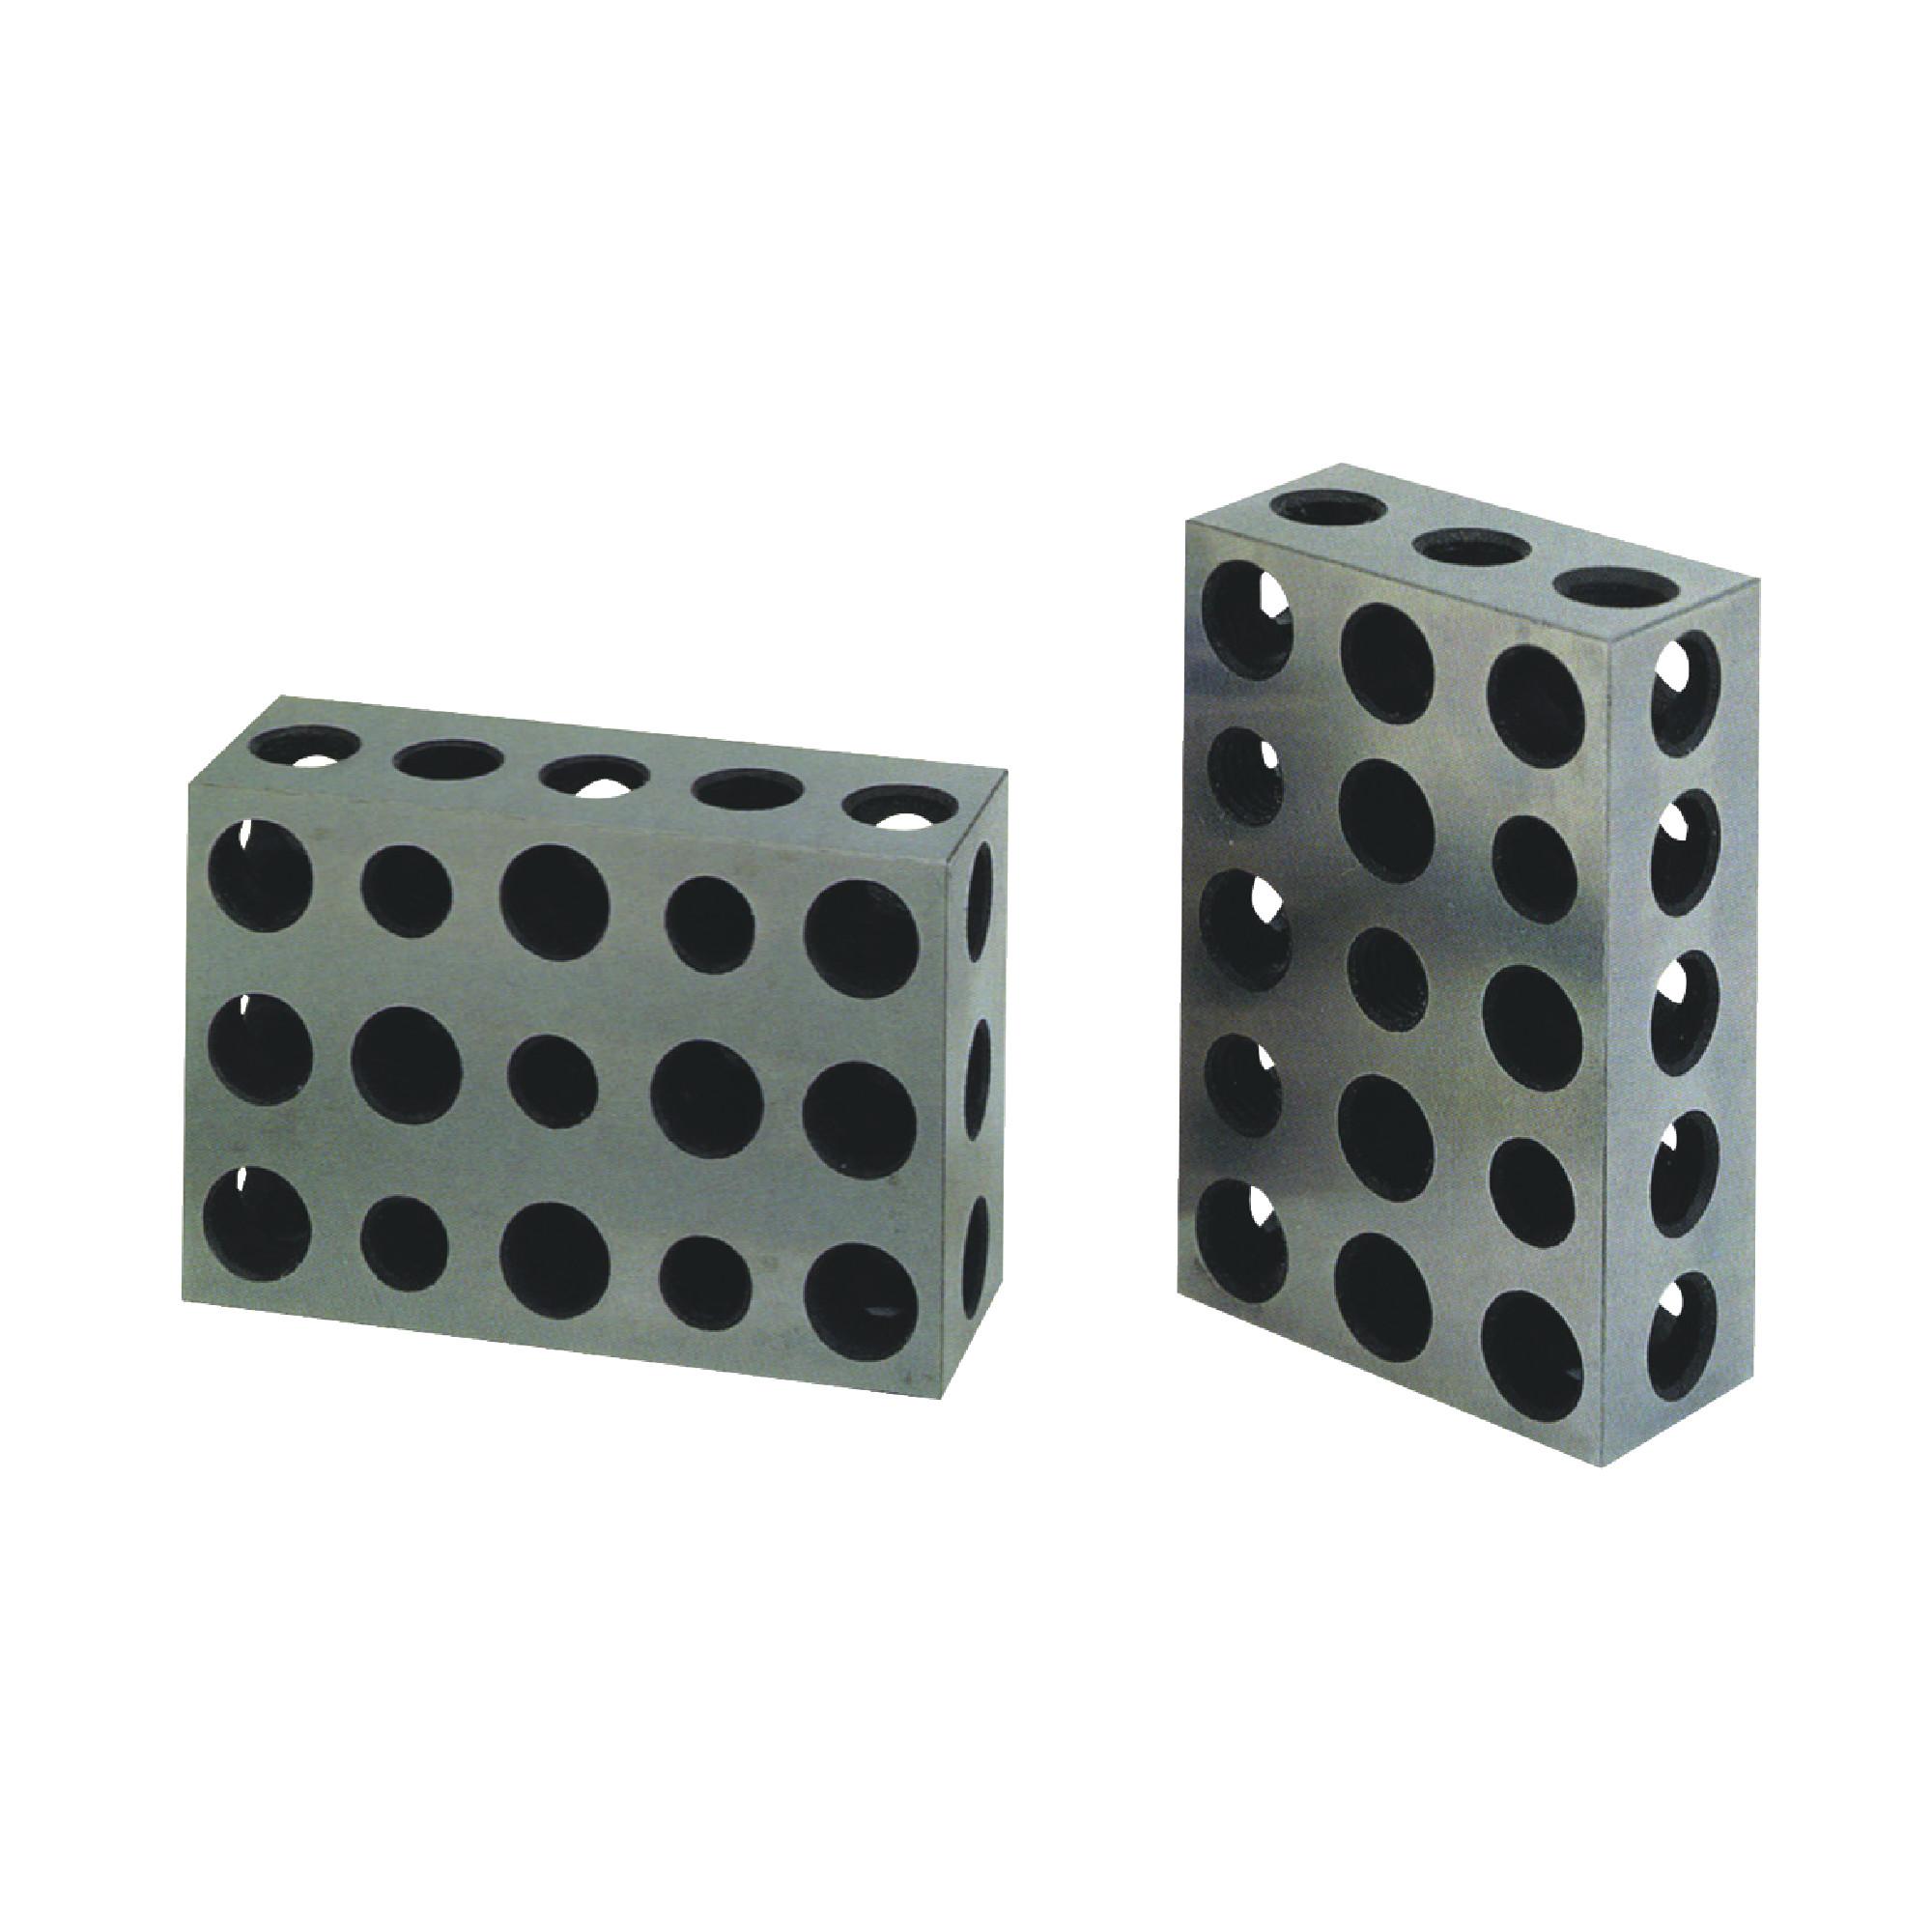 Precision Ground 1-2-3 Block Set